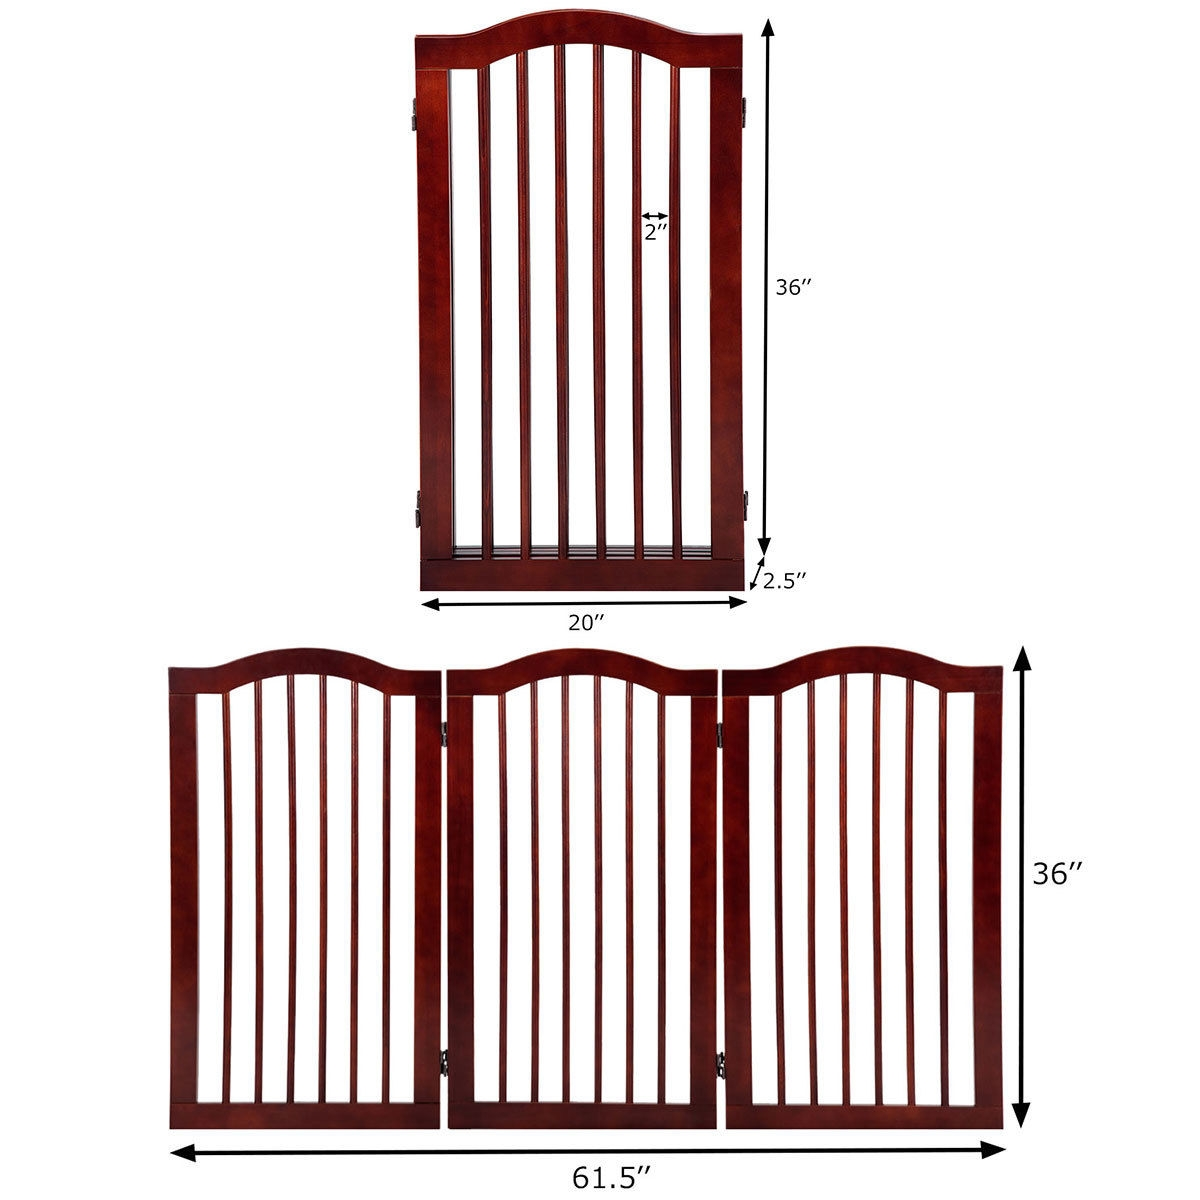 3 Panels Folding Freestanding Wood Pet Dog Safety Gate-36